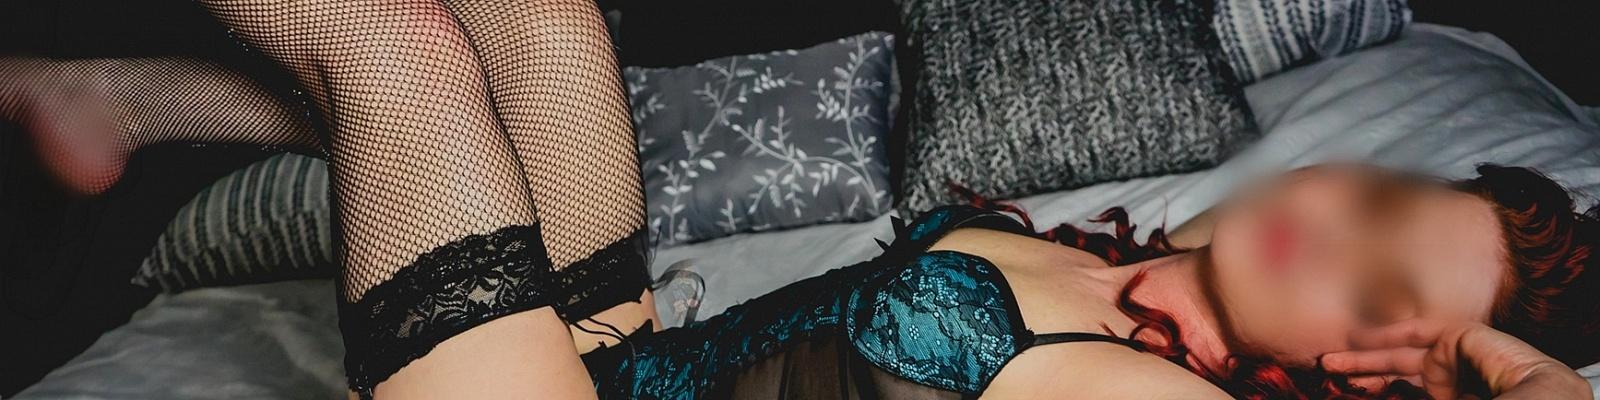 Patty Palmer's Cover Photo